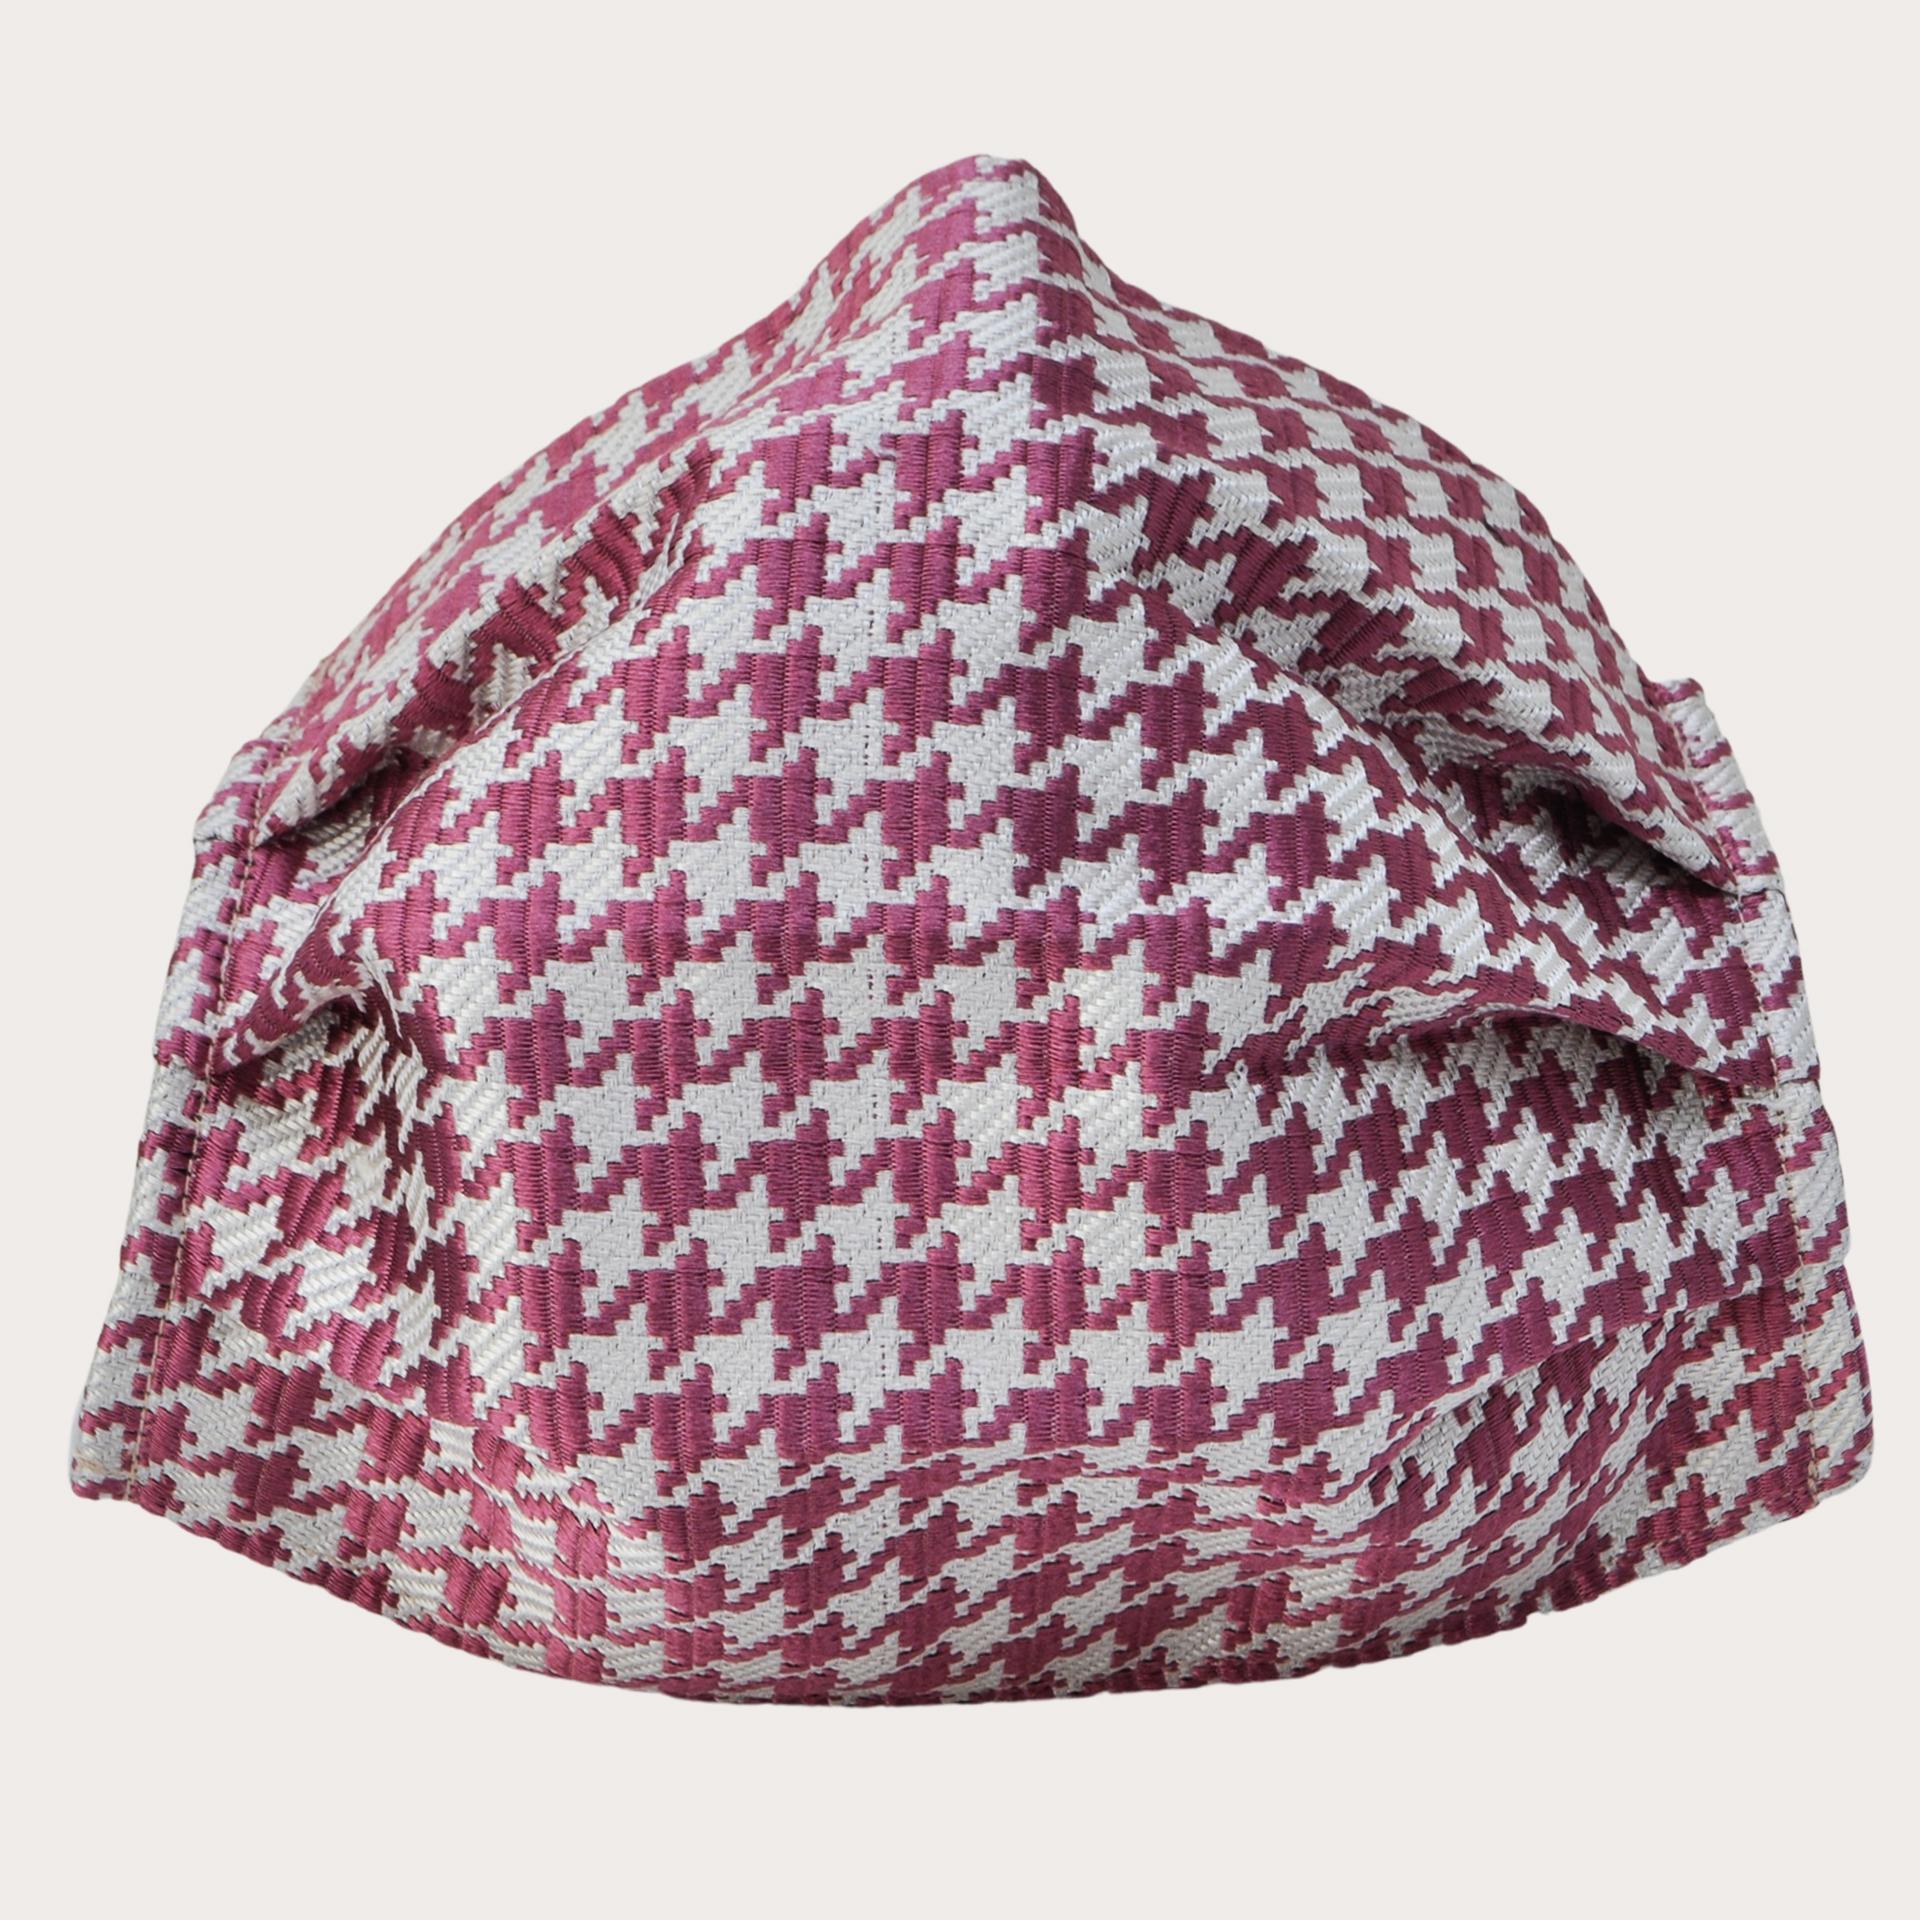 StyleMask Mascherina facciale filtrante in seta, pied de poule rosa